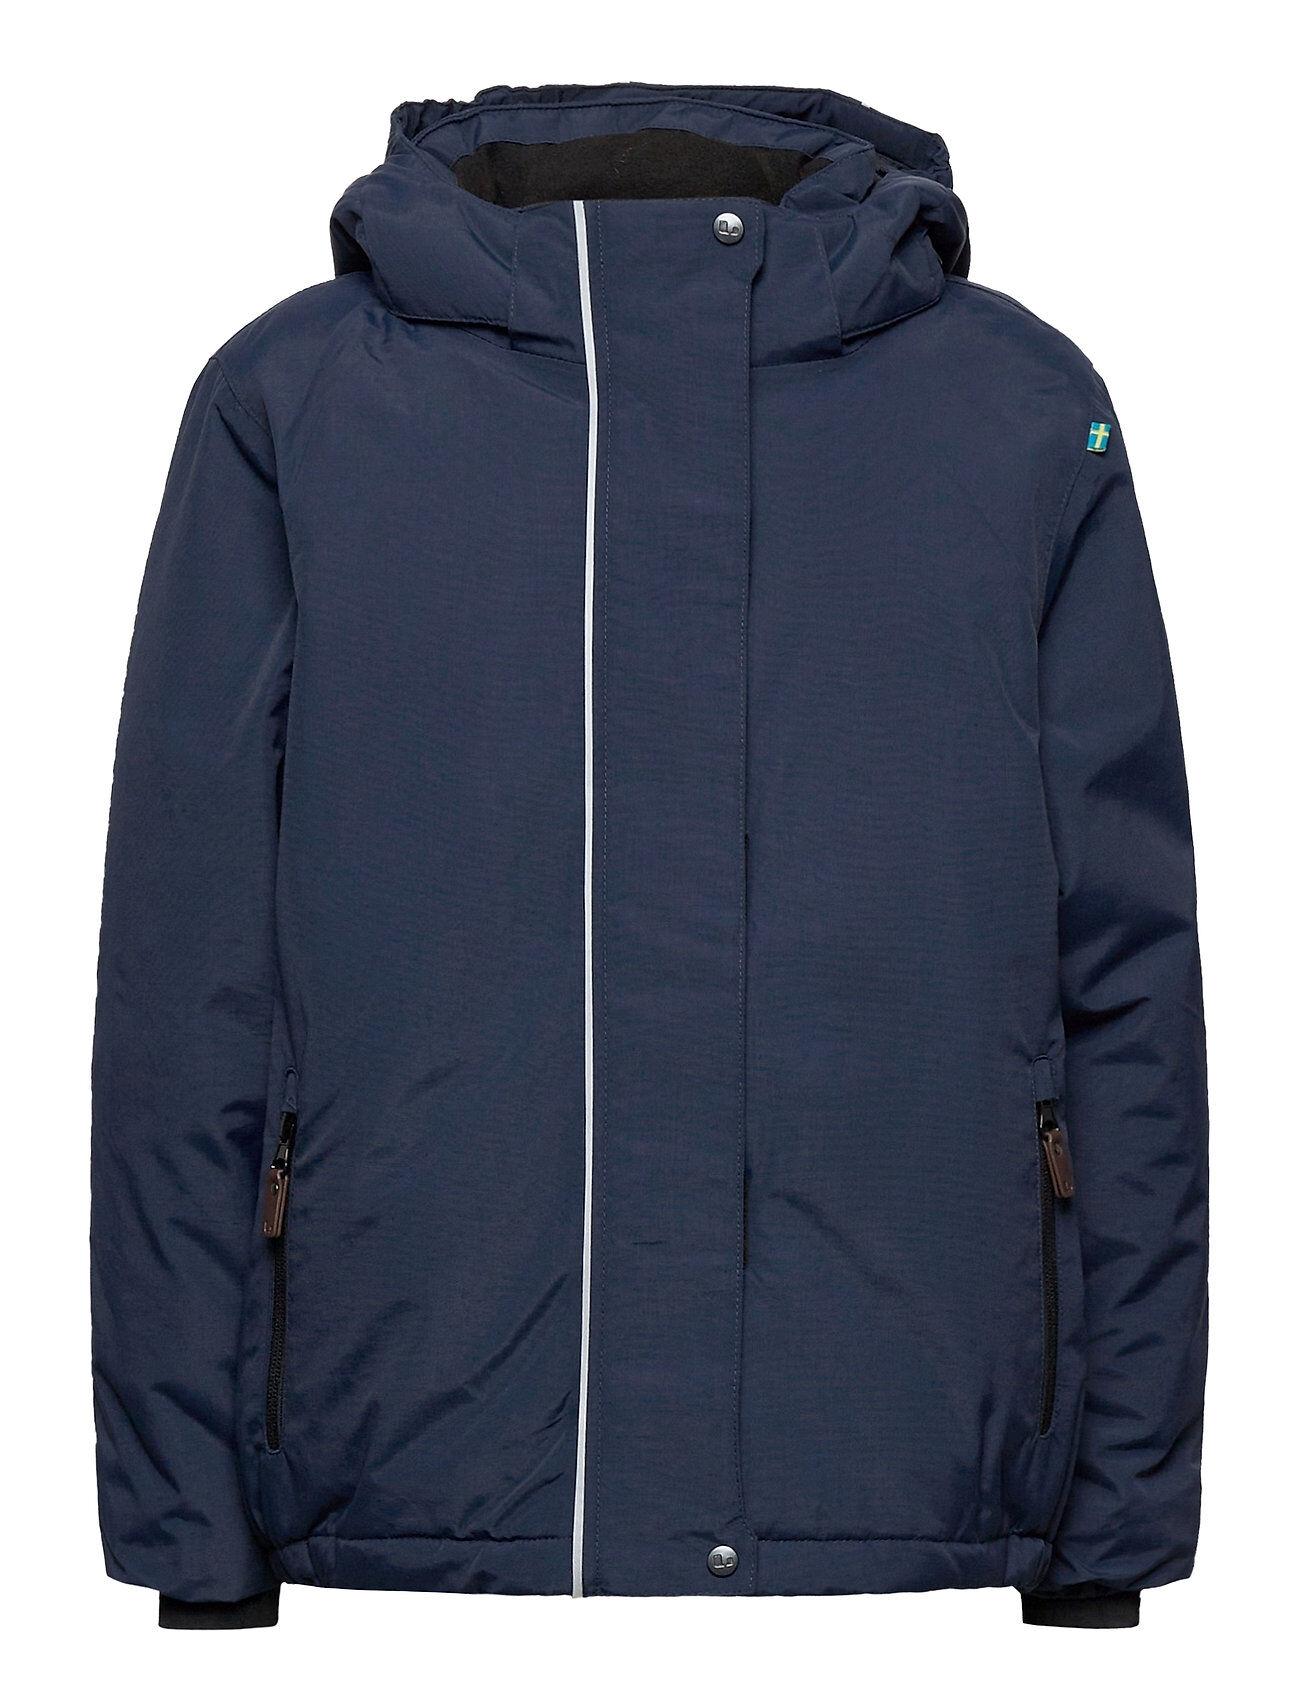 Lindberg Sweden Iceberg Jacket Outerwear Snow/ski Clothing Snow/ski Jacket Sininen Lindberg Sweden